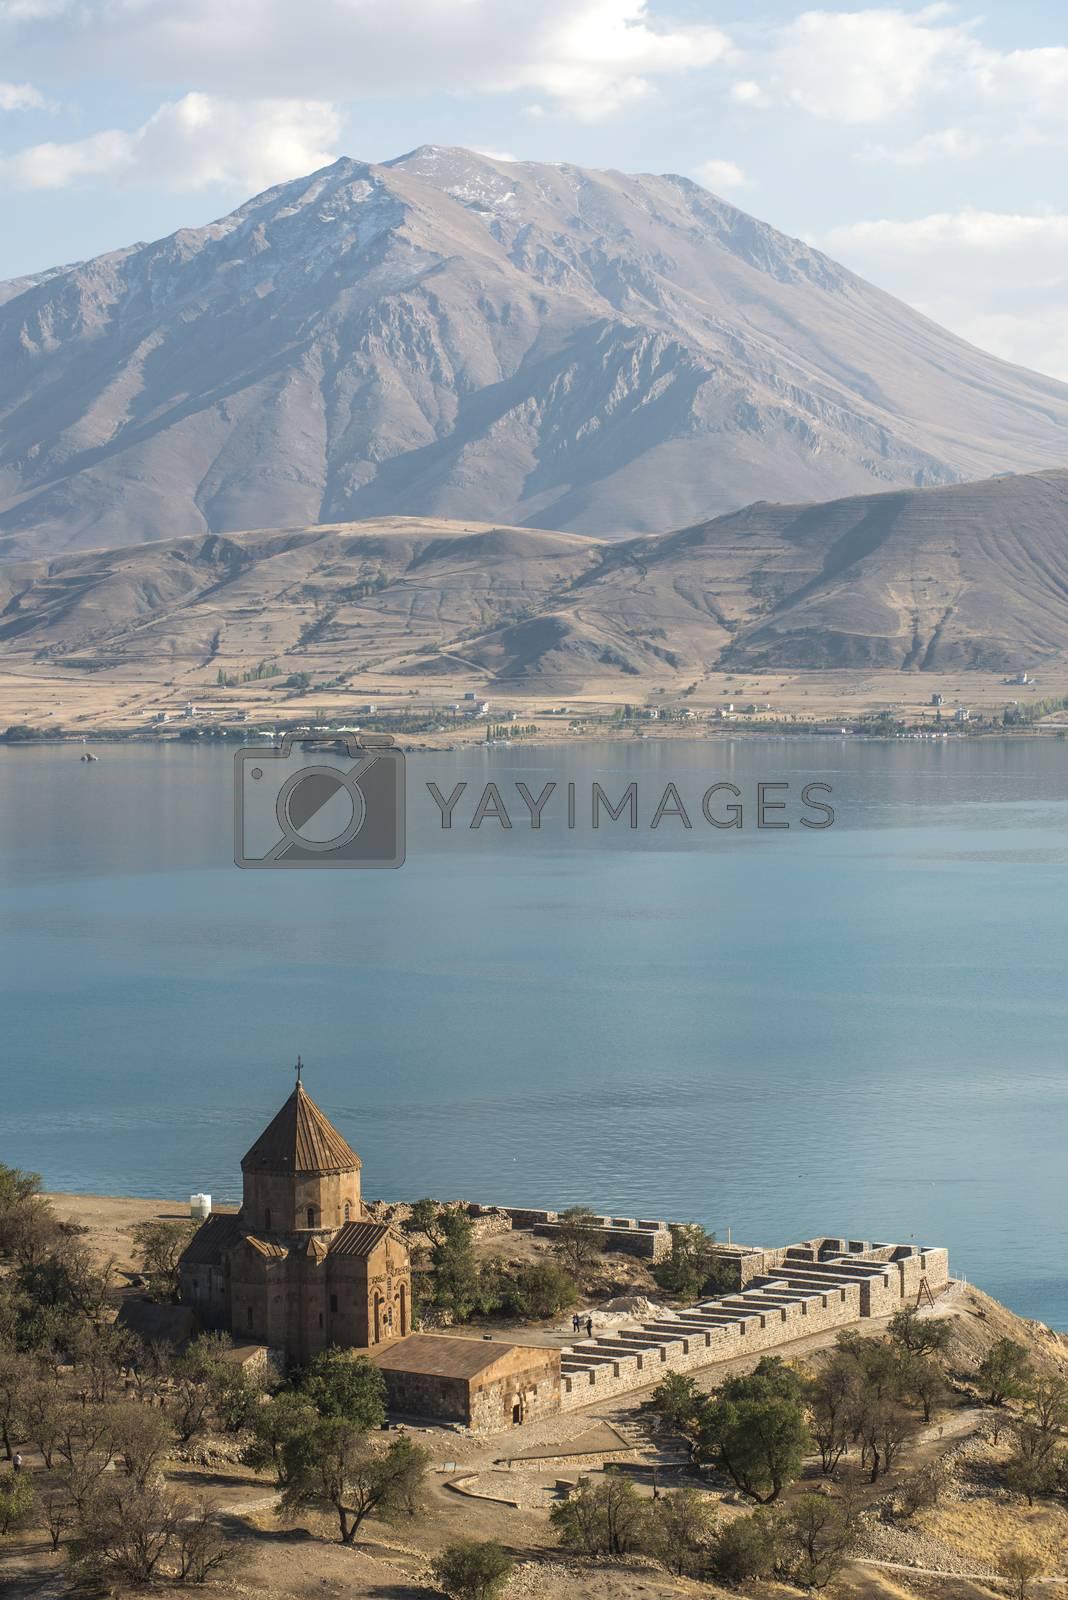 Royalty free image of Akdamar Island by emirkoo